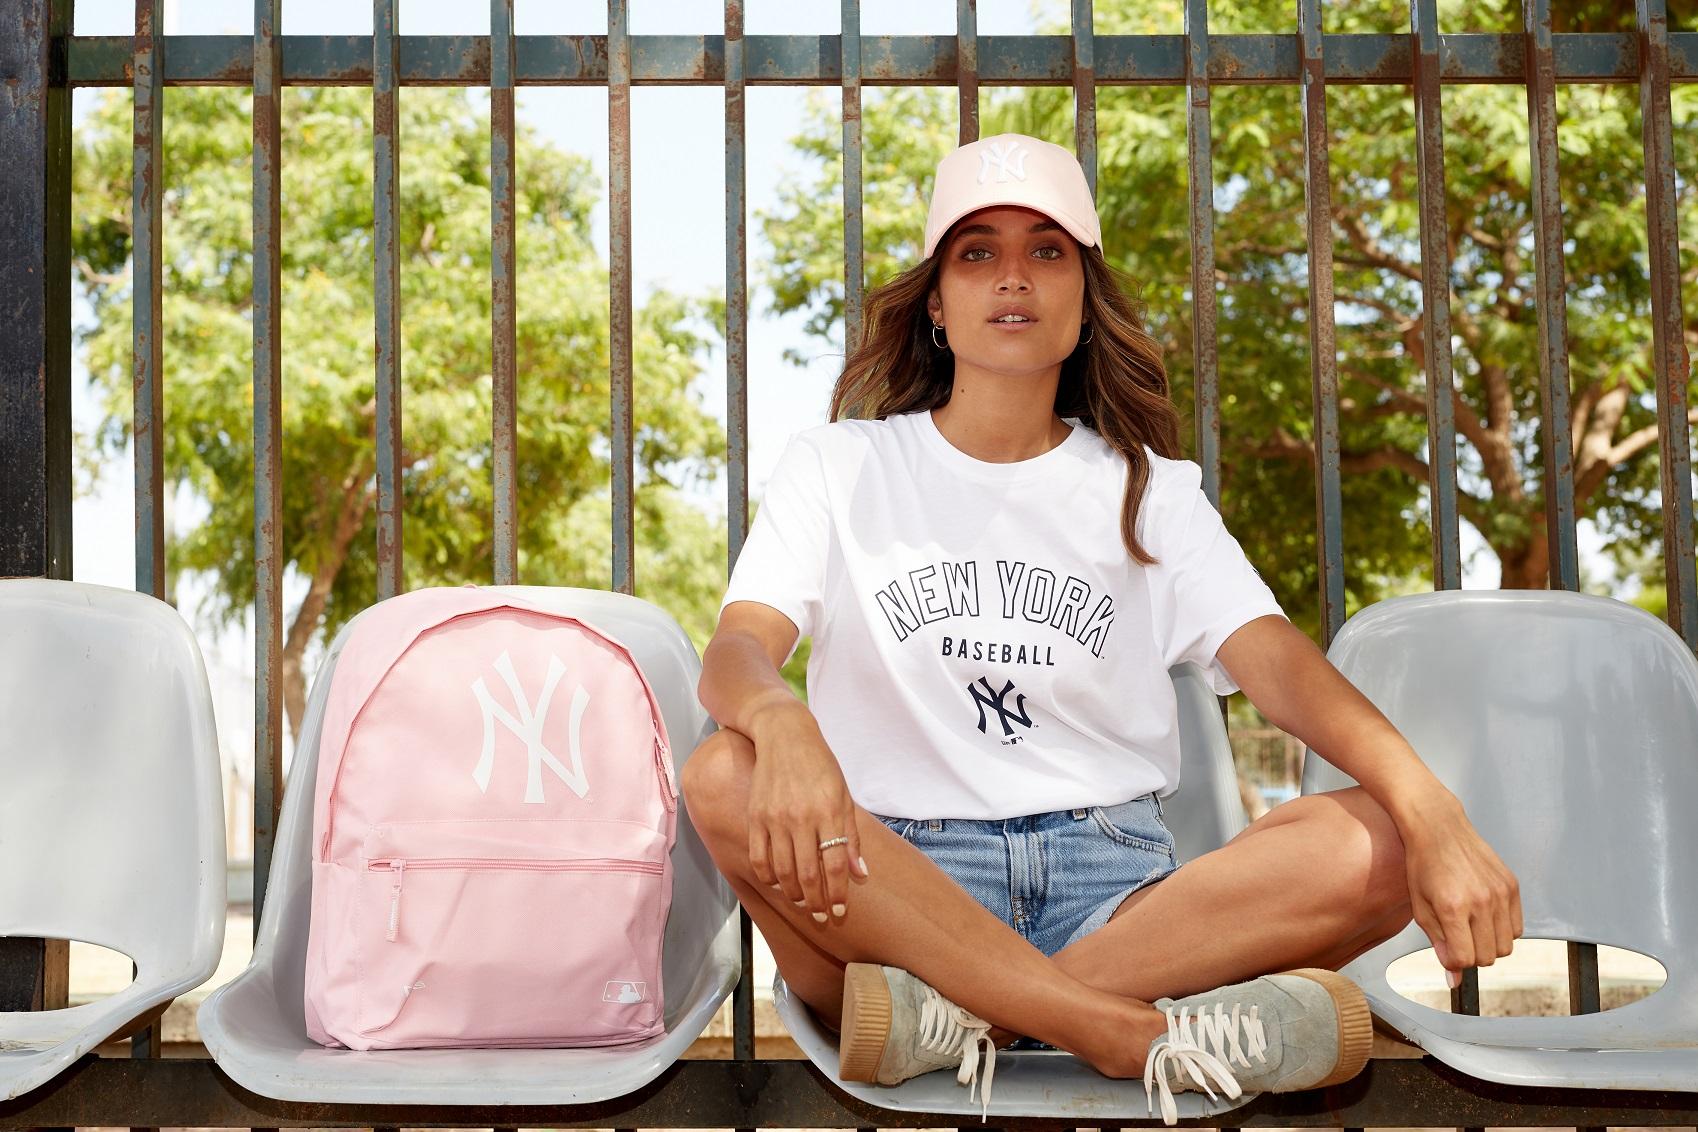 Back to School: модный бренд New Era напомнил о школе